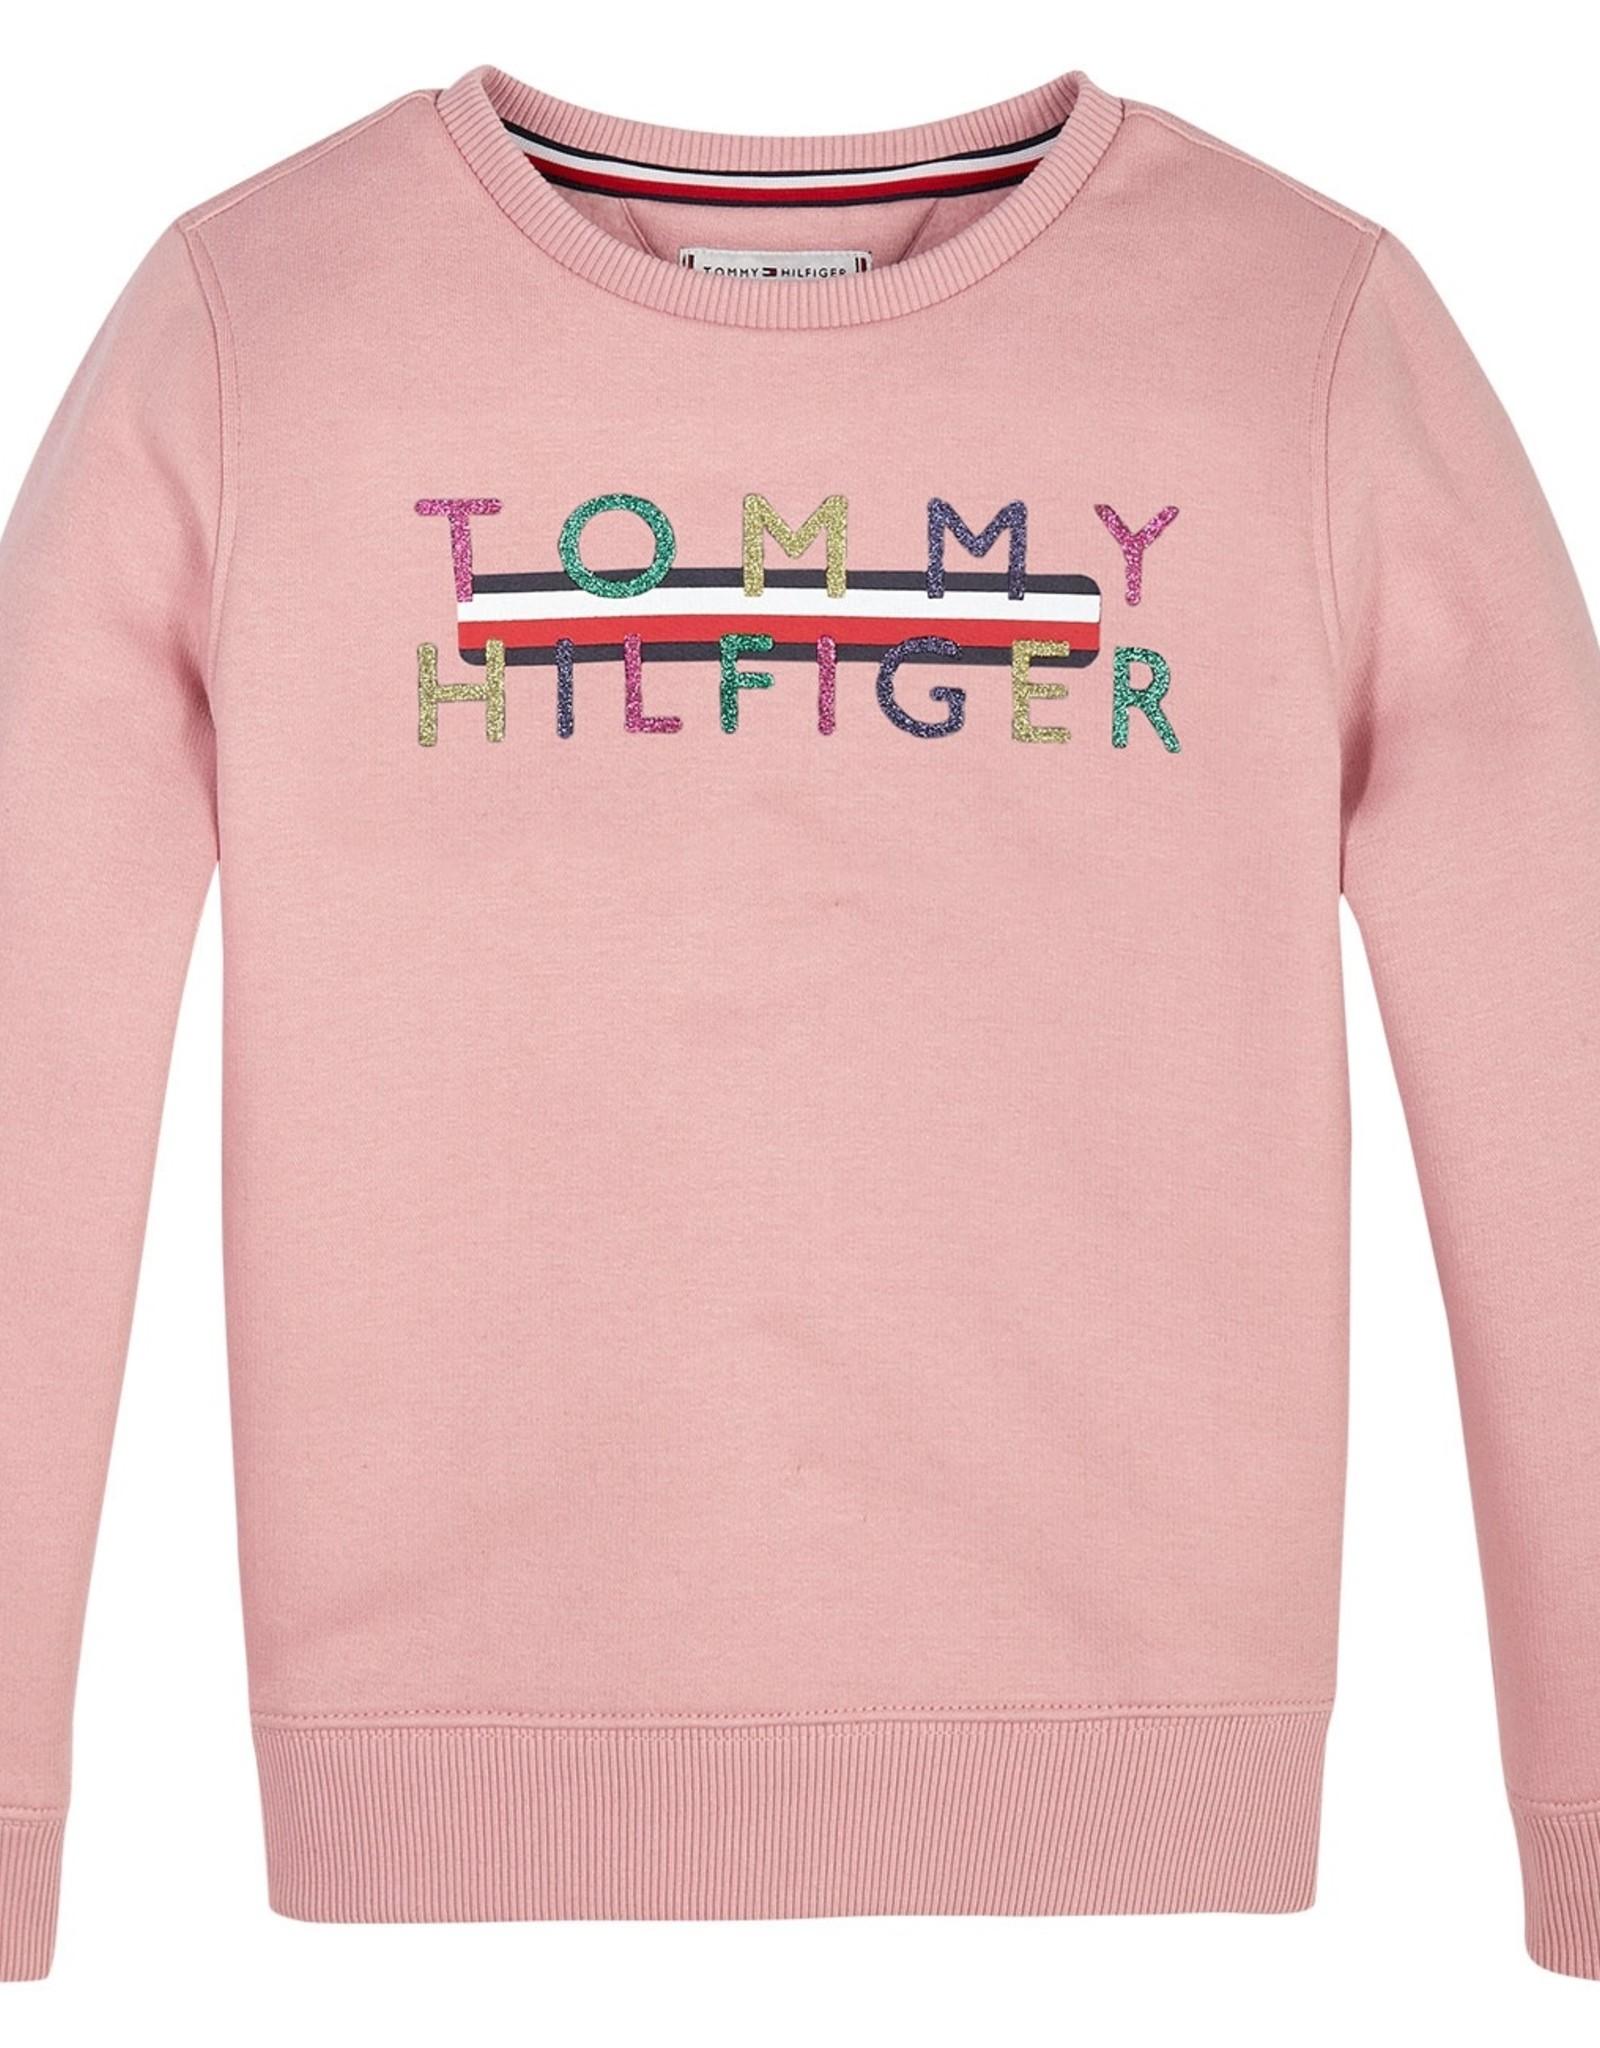 Tommy Hilfiger Iconic Logo Crew Swe, VFM